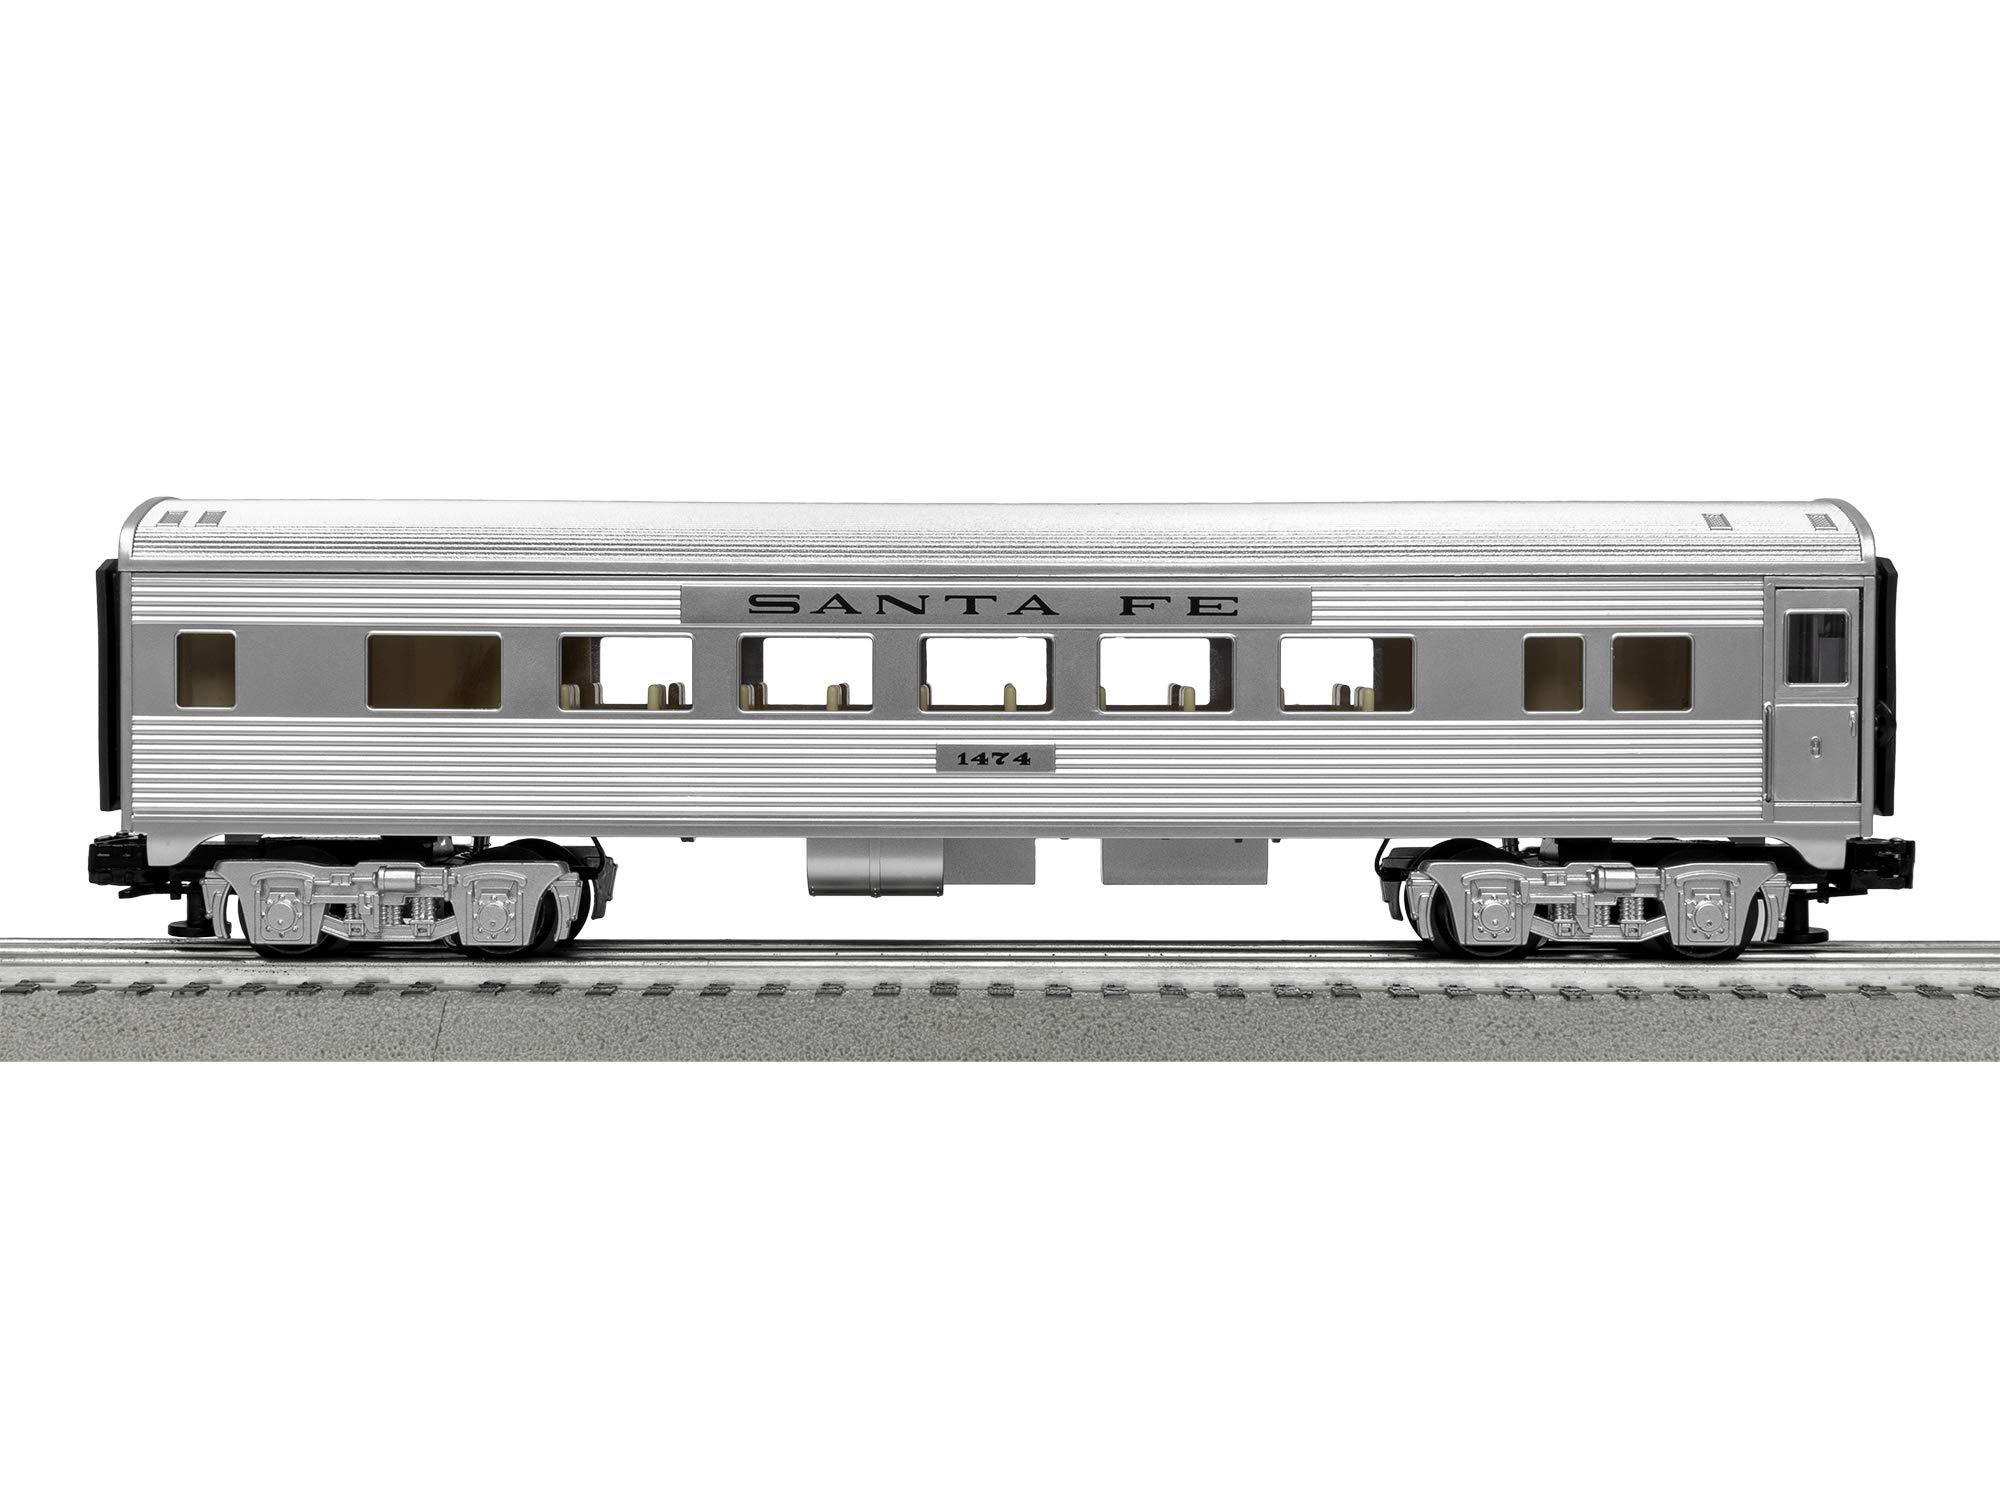 Lionel Santa Fe Super Chief Electric O Gauge Model Train Set w/ Remote and Bluetooth Capability by Lionel (Image #9)